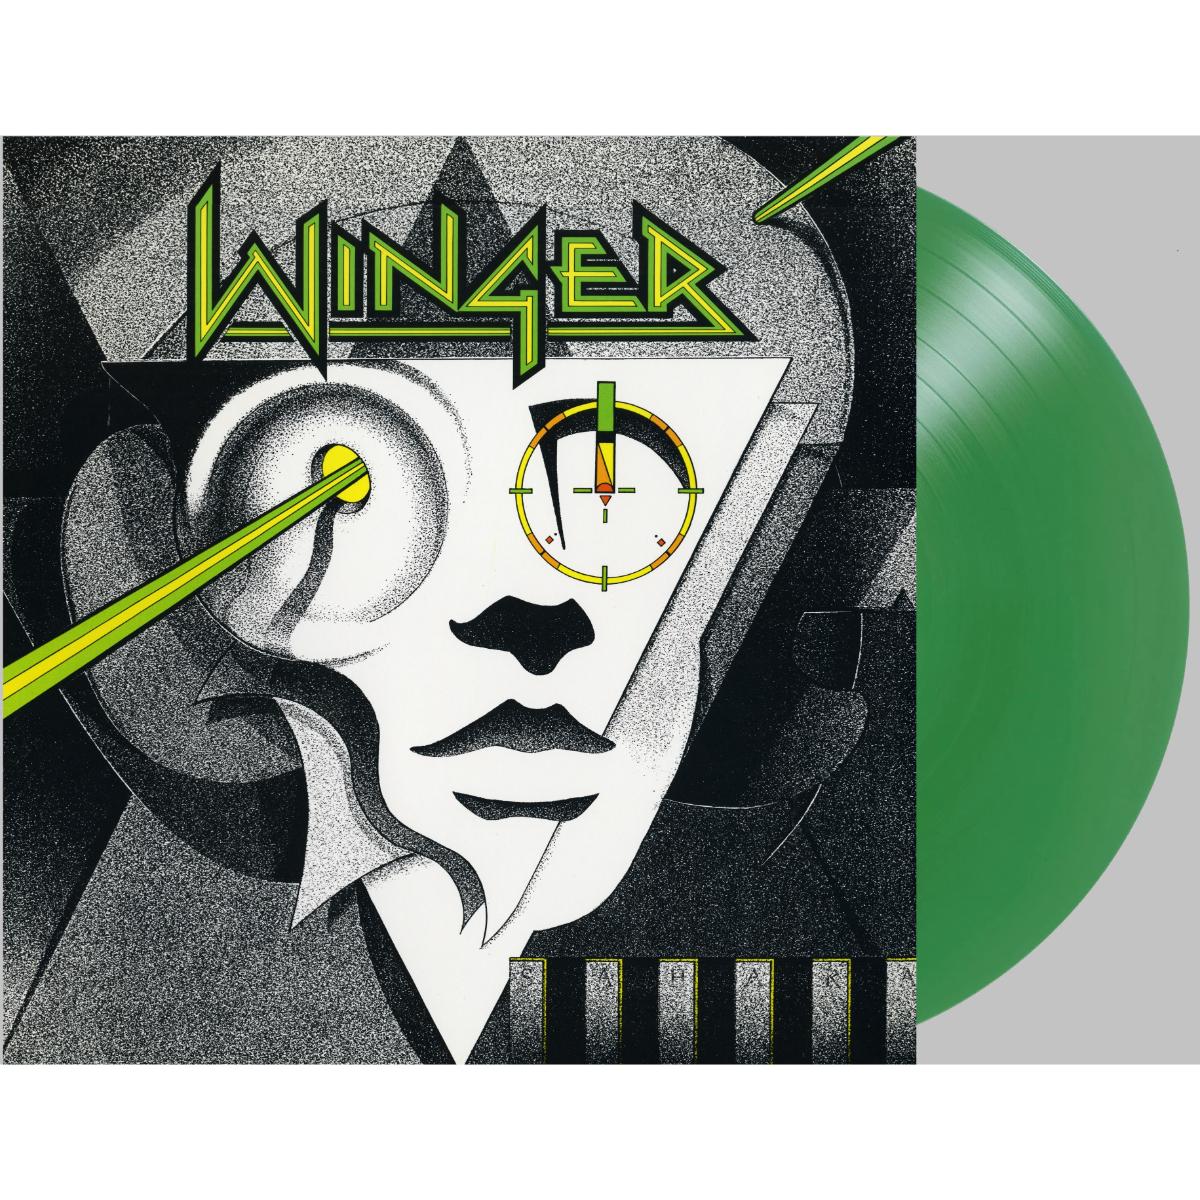 Winger - Winger (180 Gram Translucent Emerald Green Audiophile Vinyl/Limited Anniversary Edition/Bonus Track)